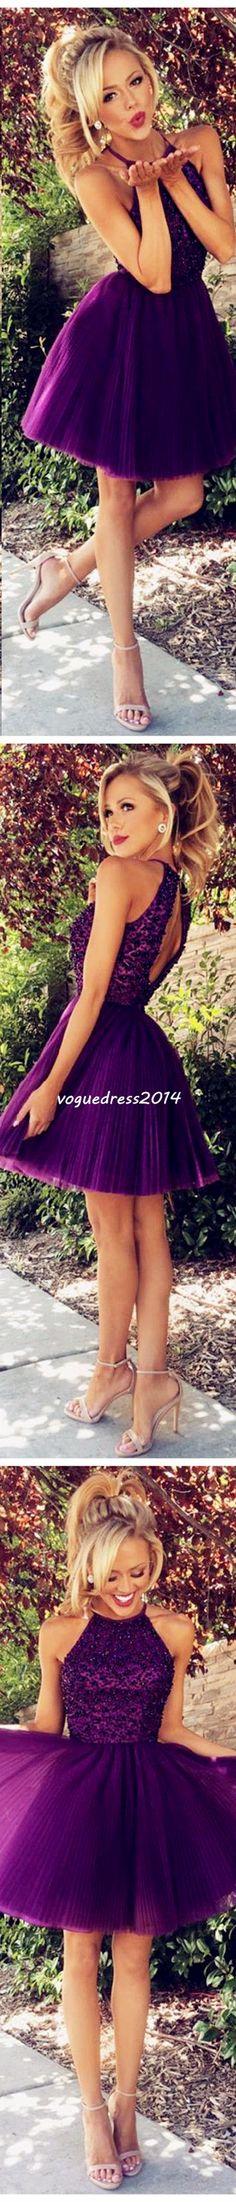 Purple High Neck open back homecoming dress,short prom dress. #promdress